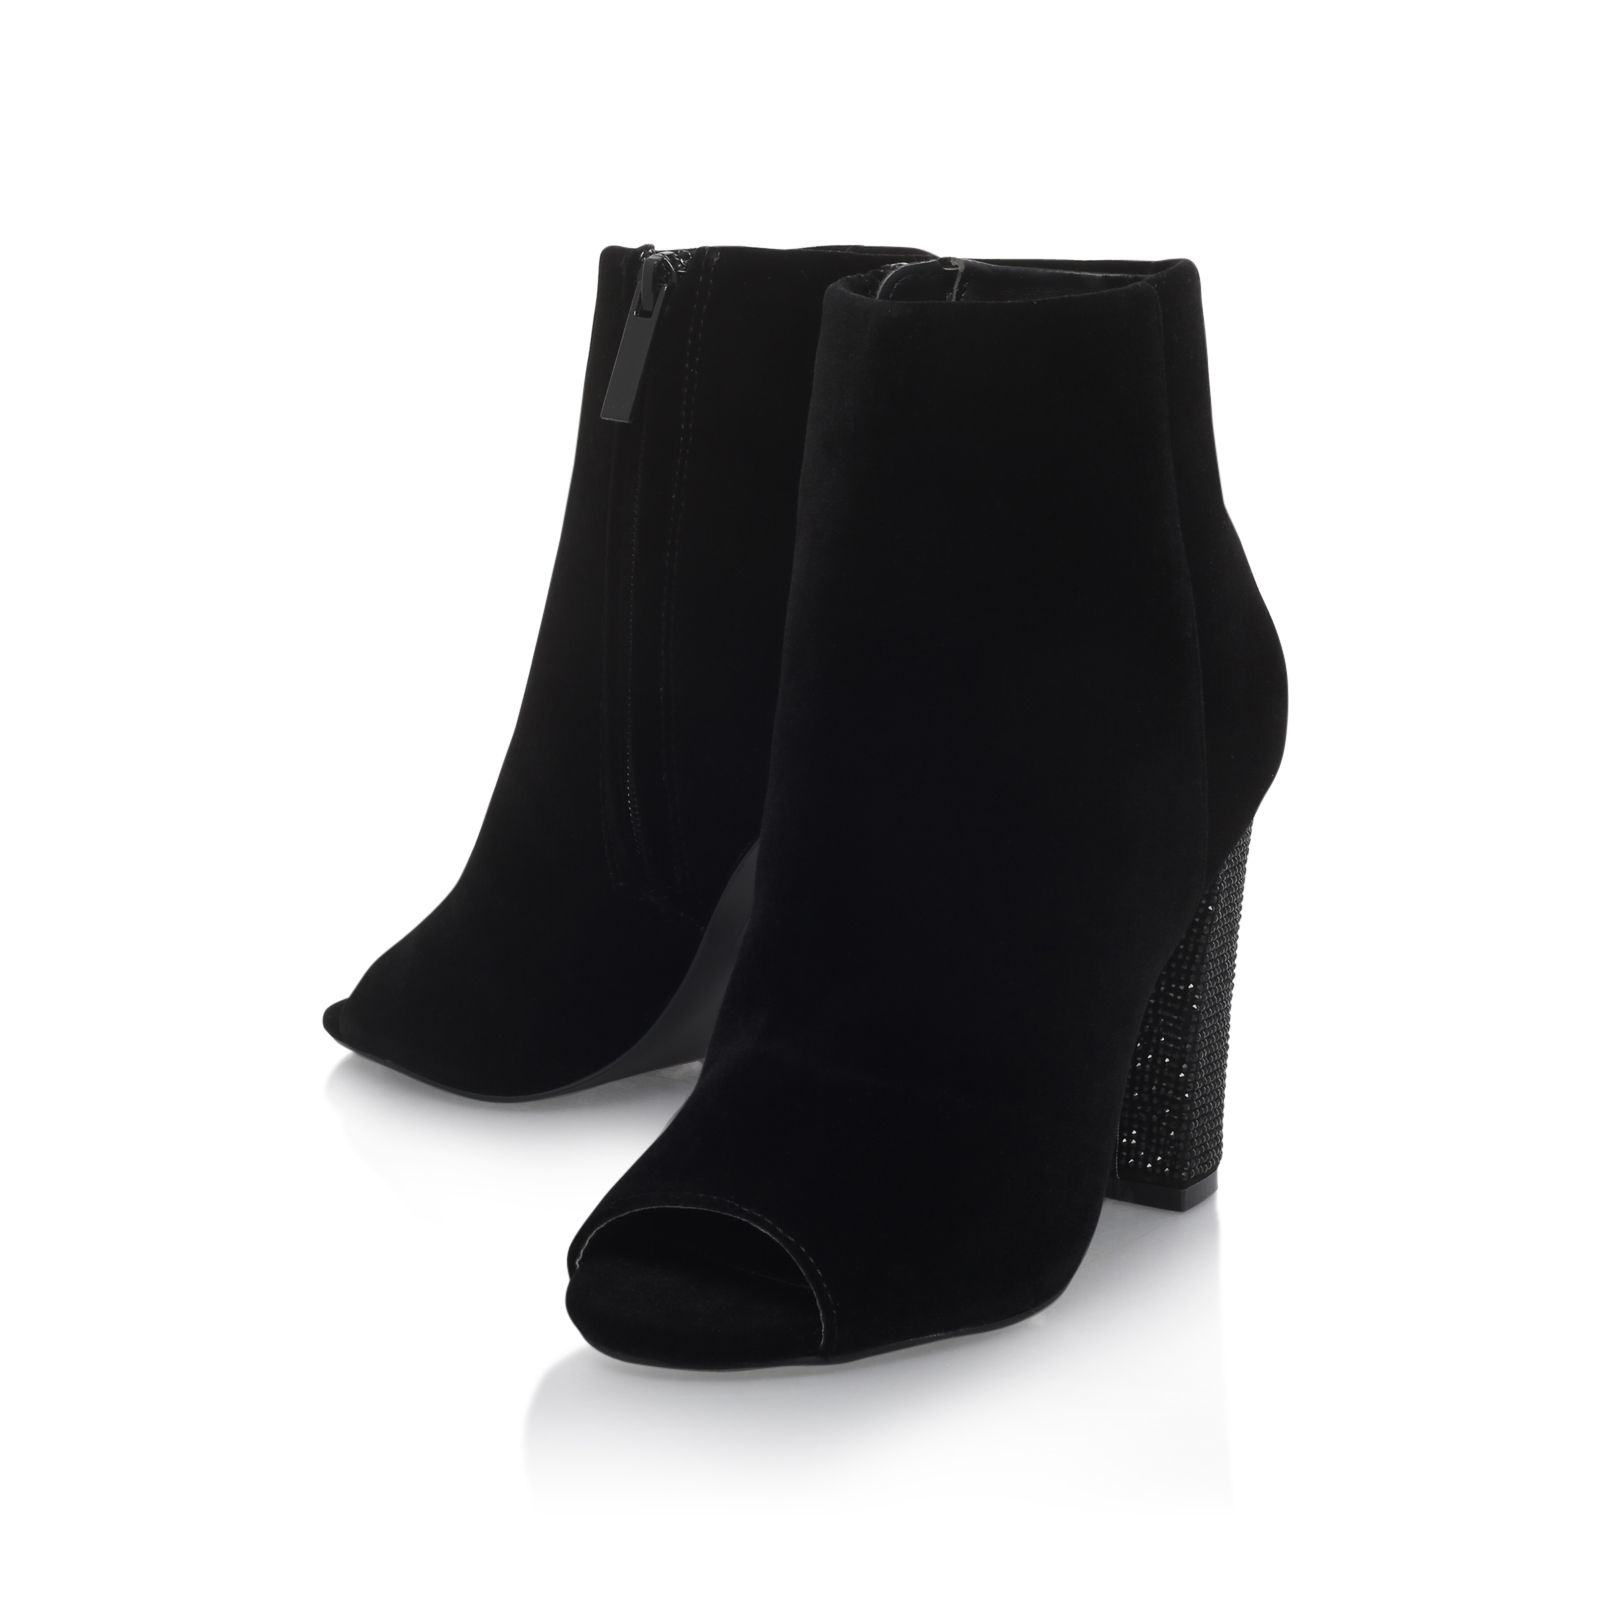 Miss Kg Synthetic Slender High Heel Shoe Boots in Black